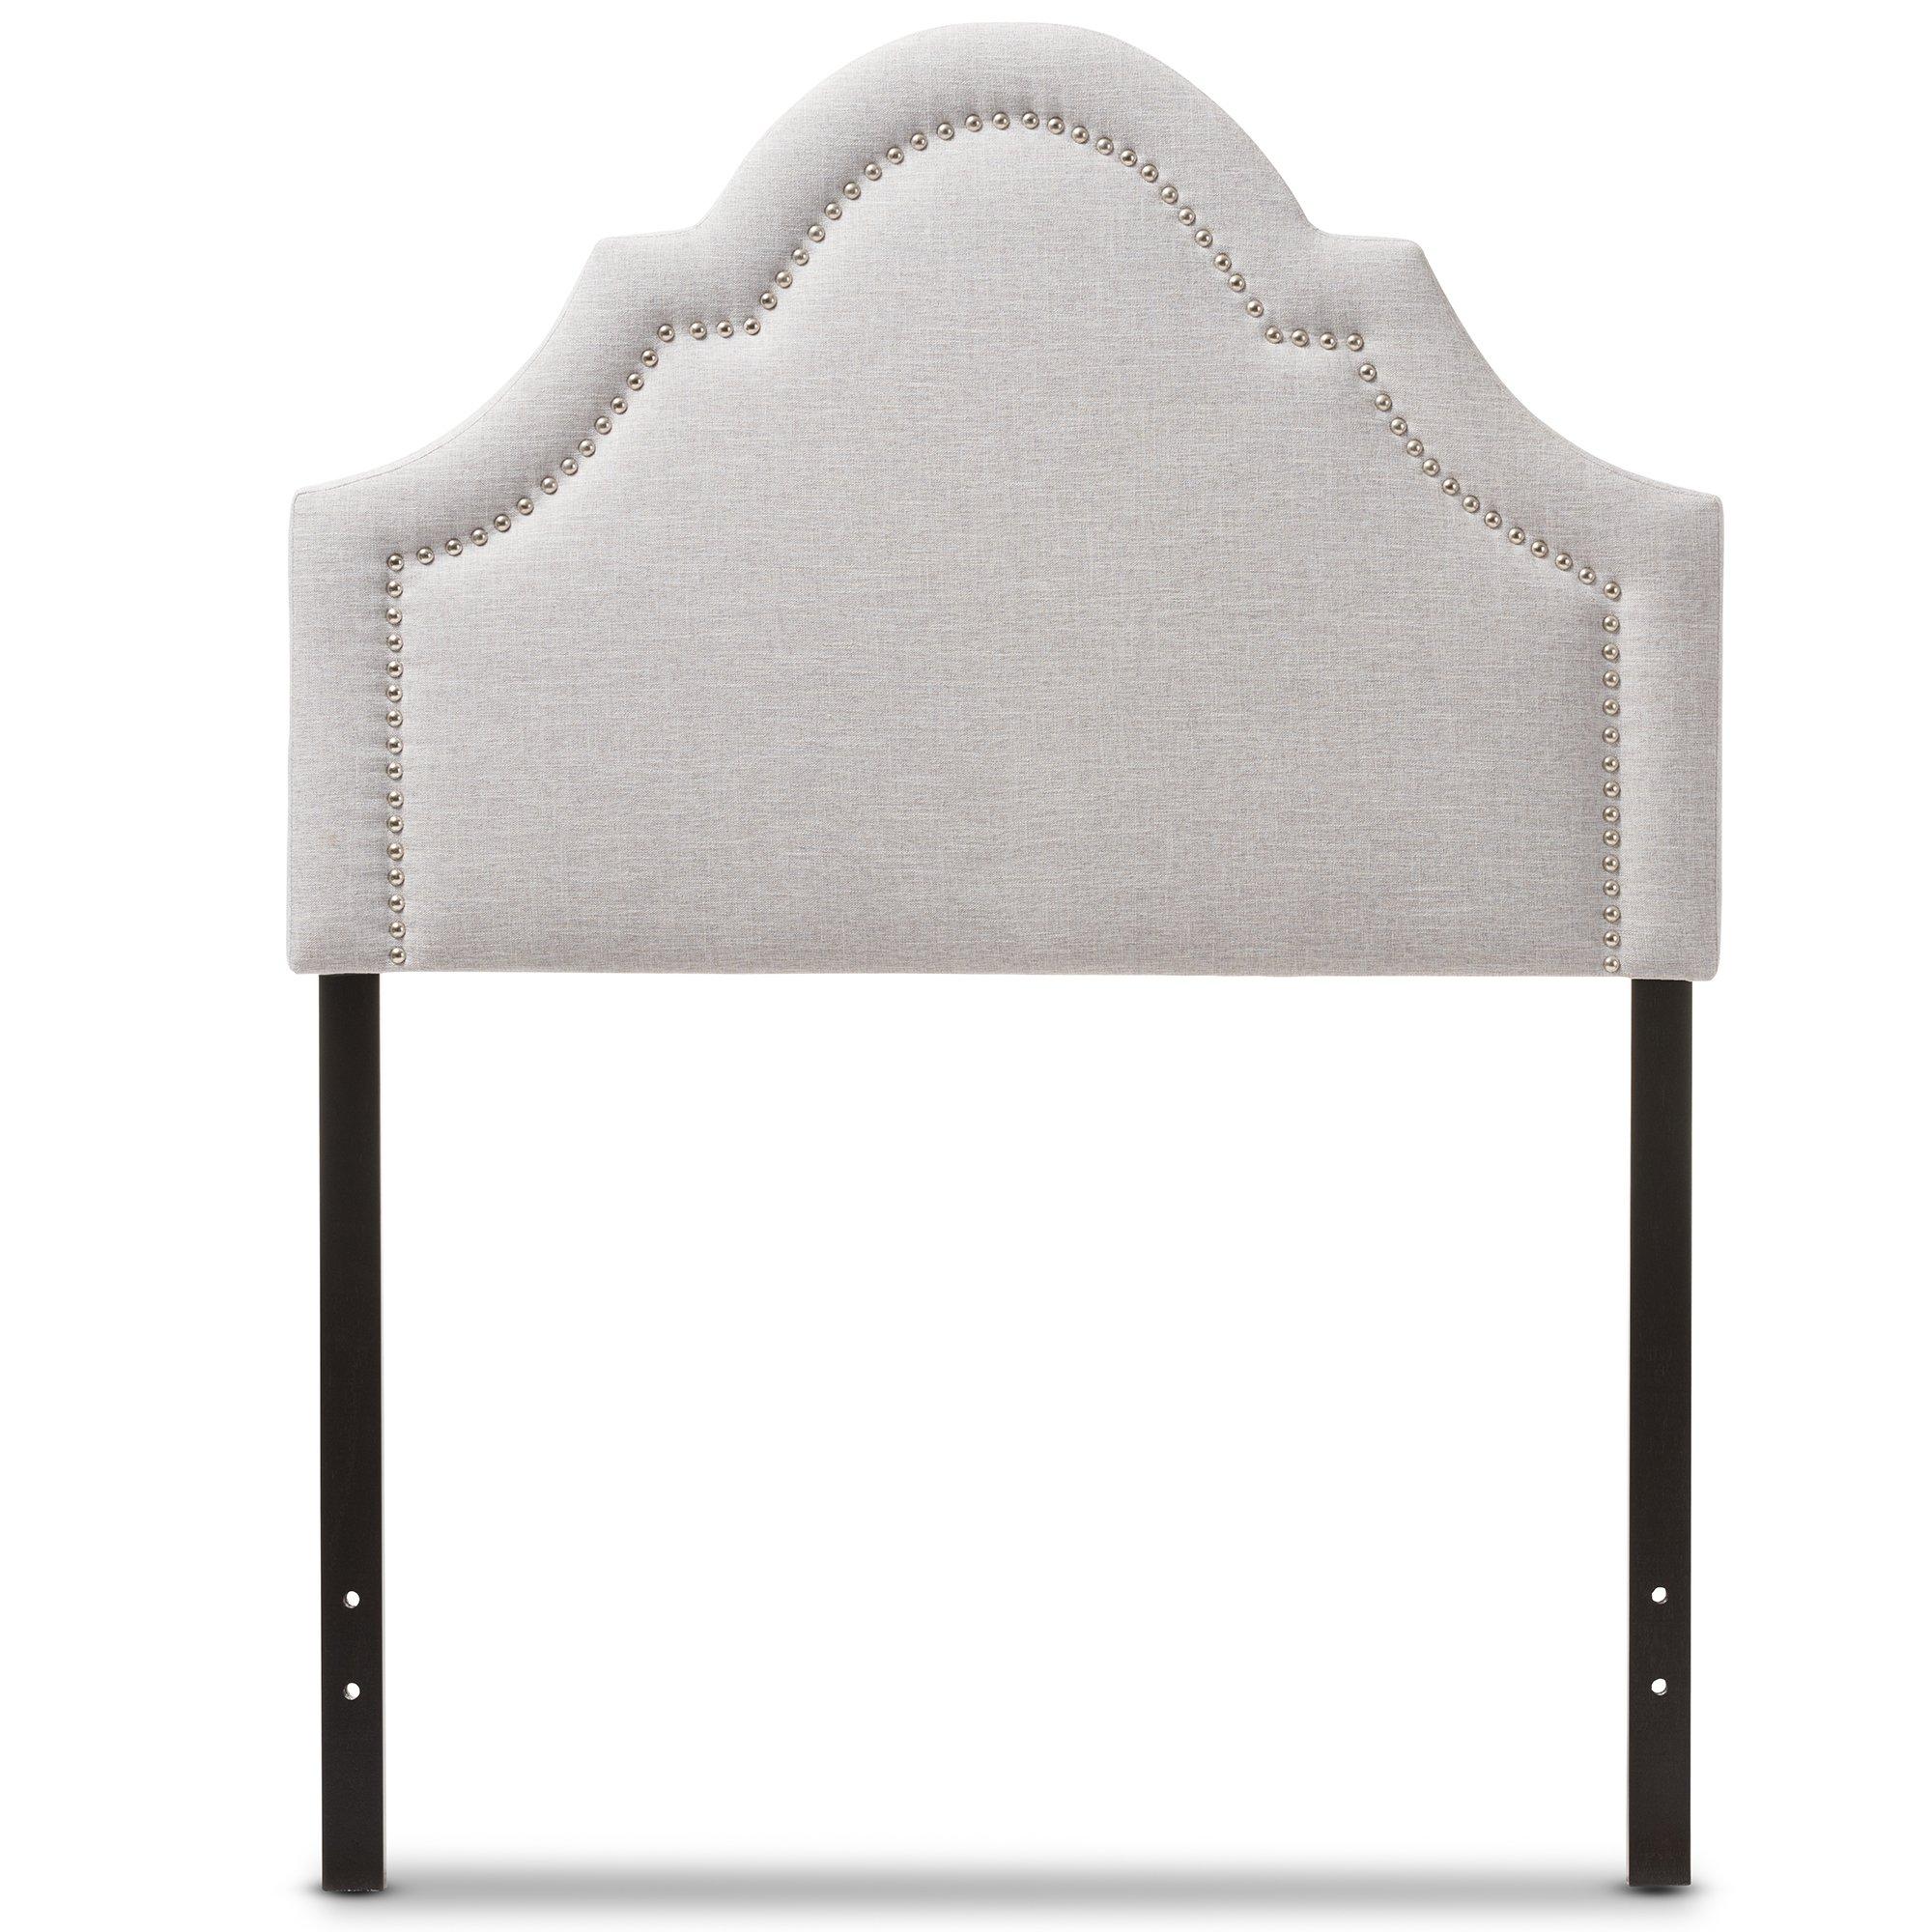 Baxton Studio Remi Modern and Contemporary Greyish Beige Fabric Upholstered Headboard, Twin